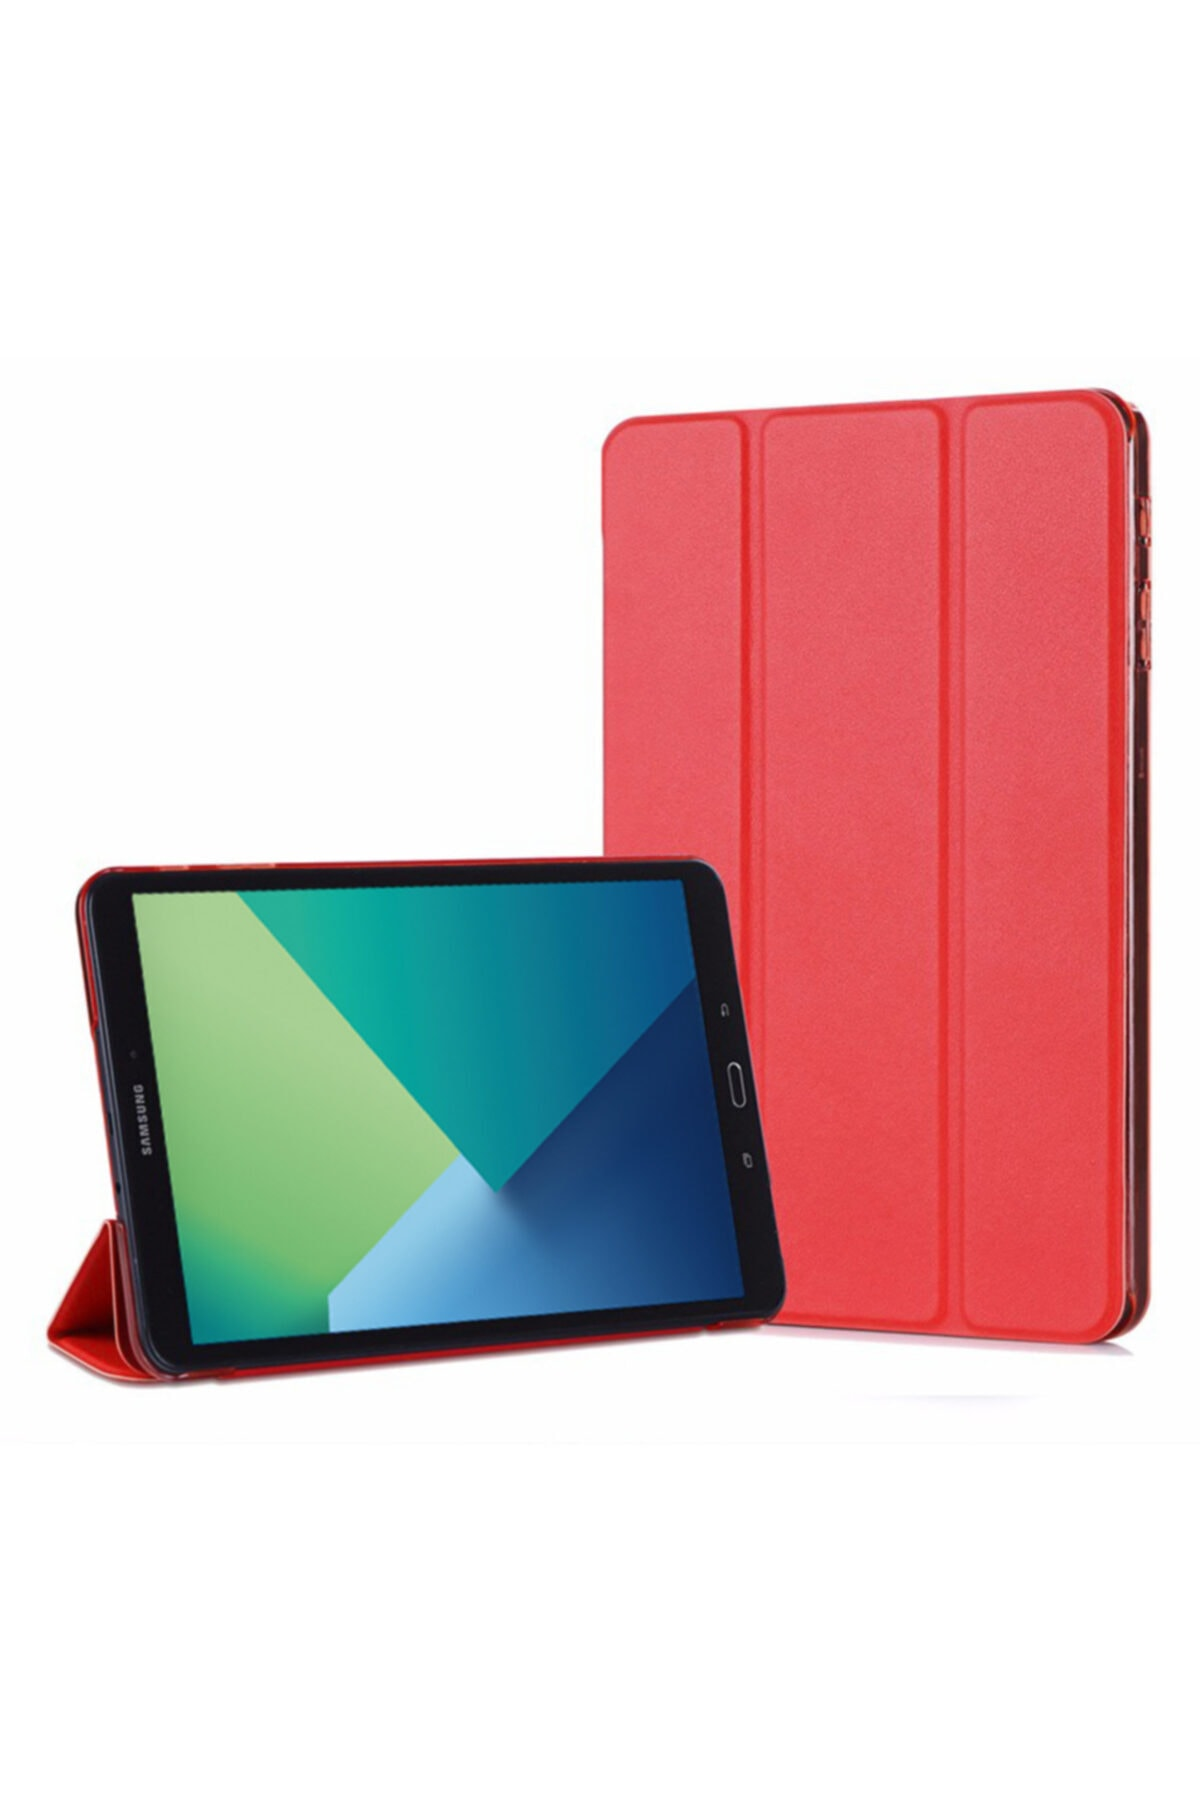 Microsonic Galaxy Tab A 10.1'' P580 Smart Case Ve Arka Kılıf, Microsonic Kırmızı 1